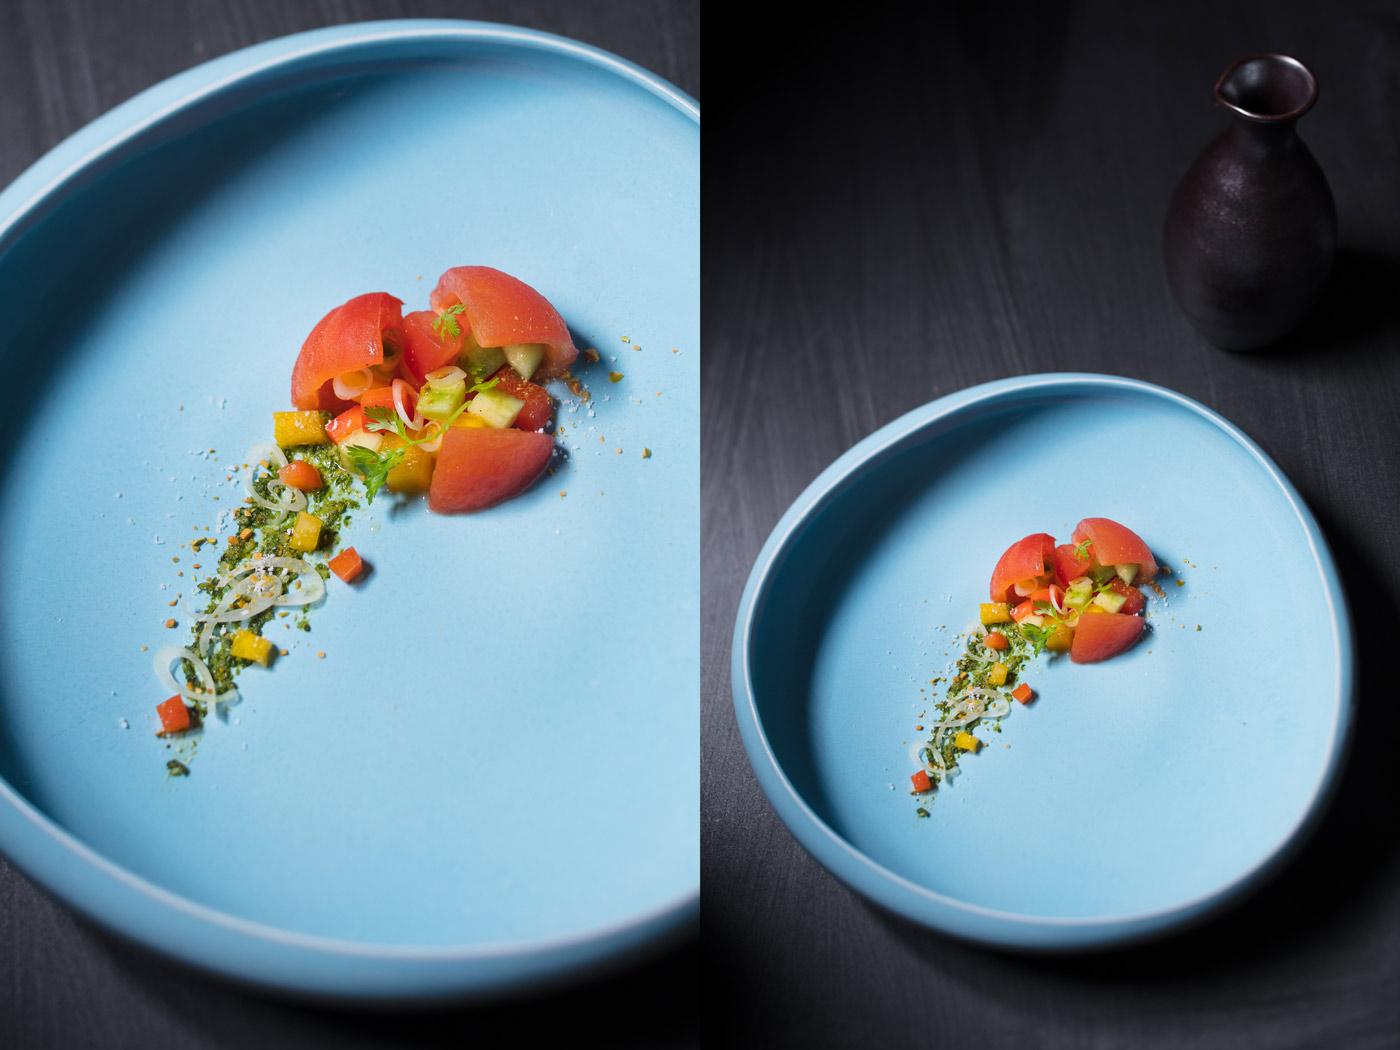 Recipe image, tomato salad with basil pesto